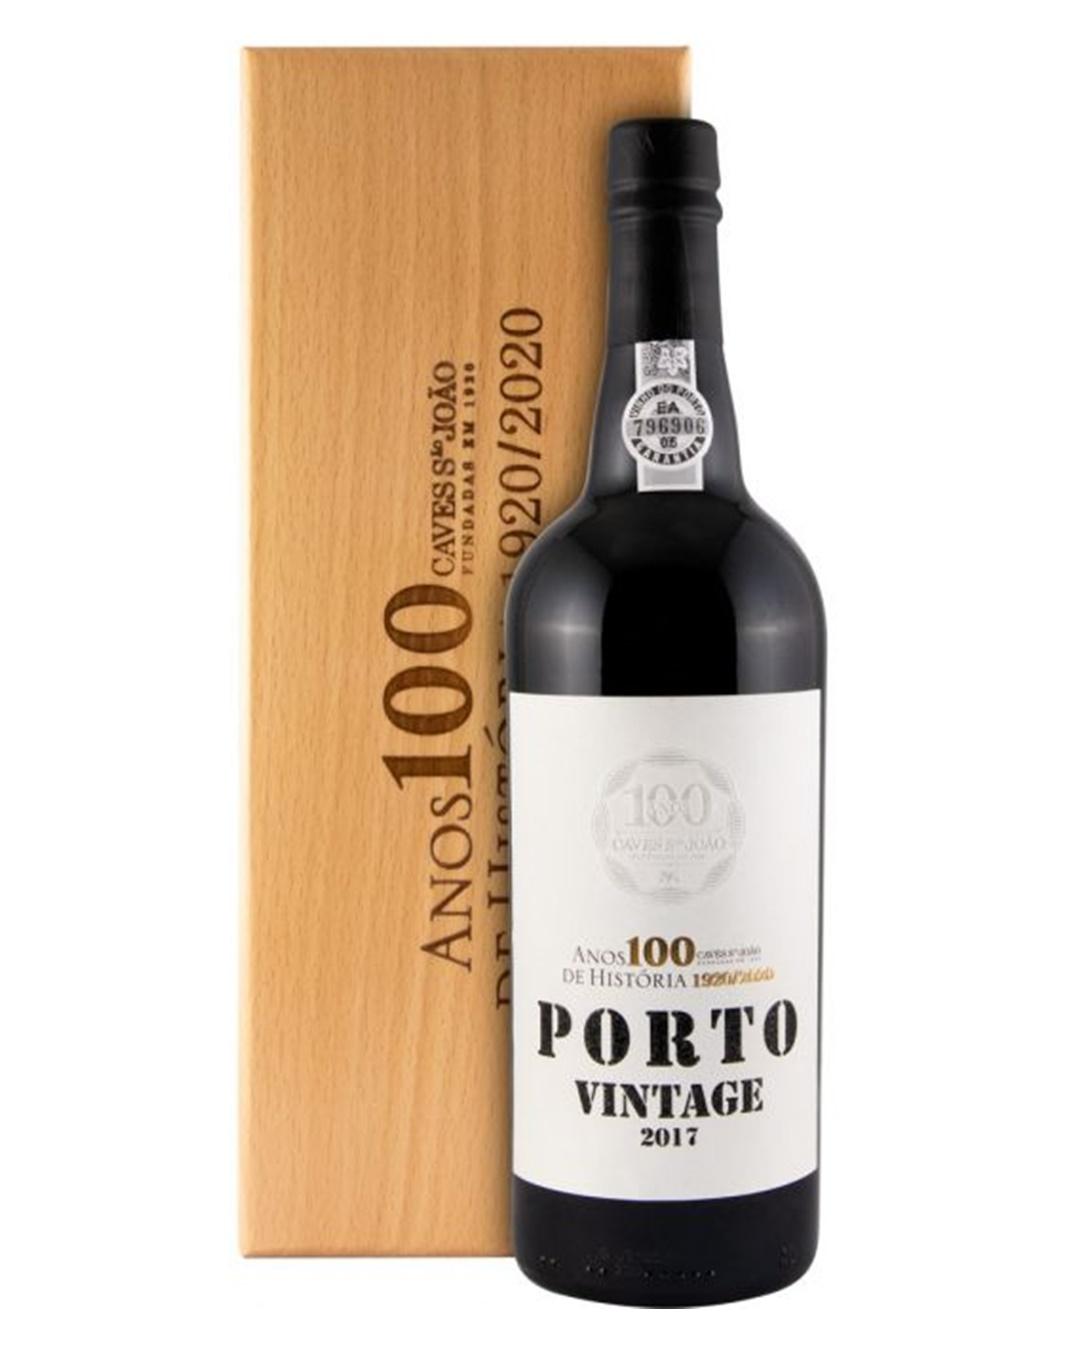 Vinho do Porto Vintage 2017